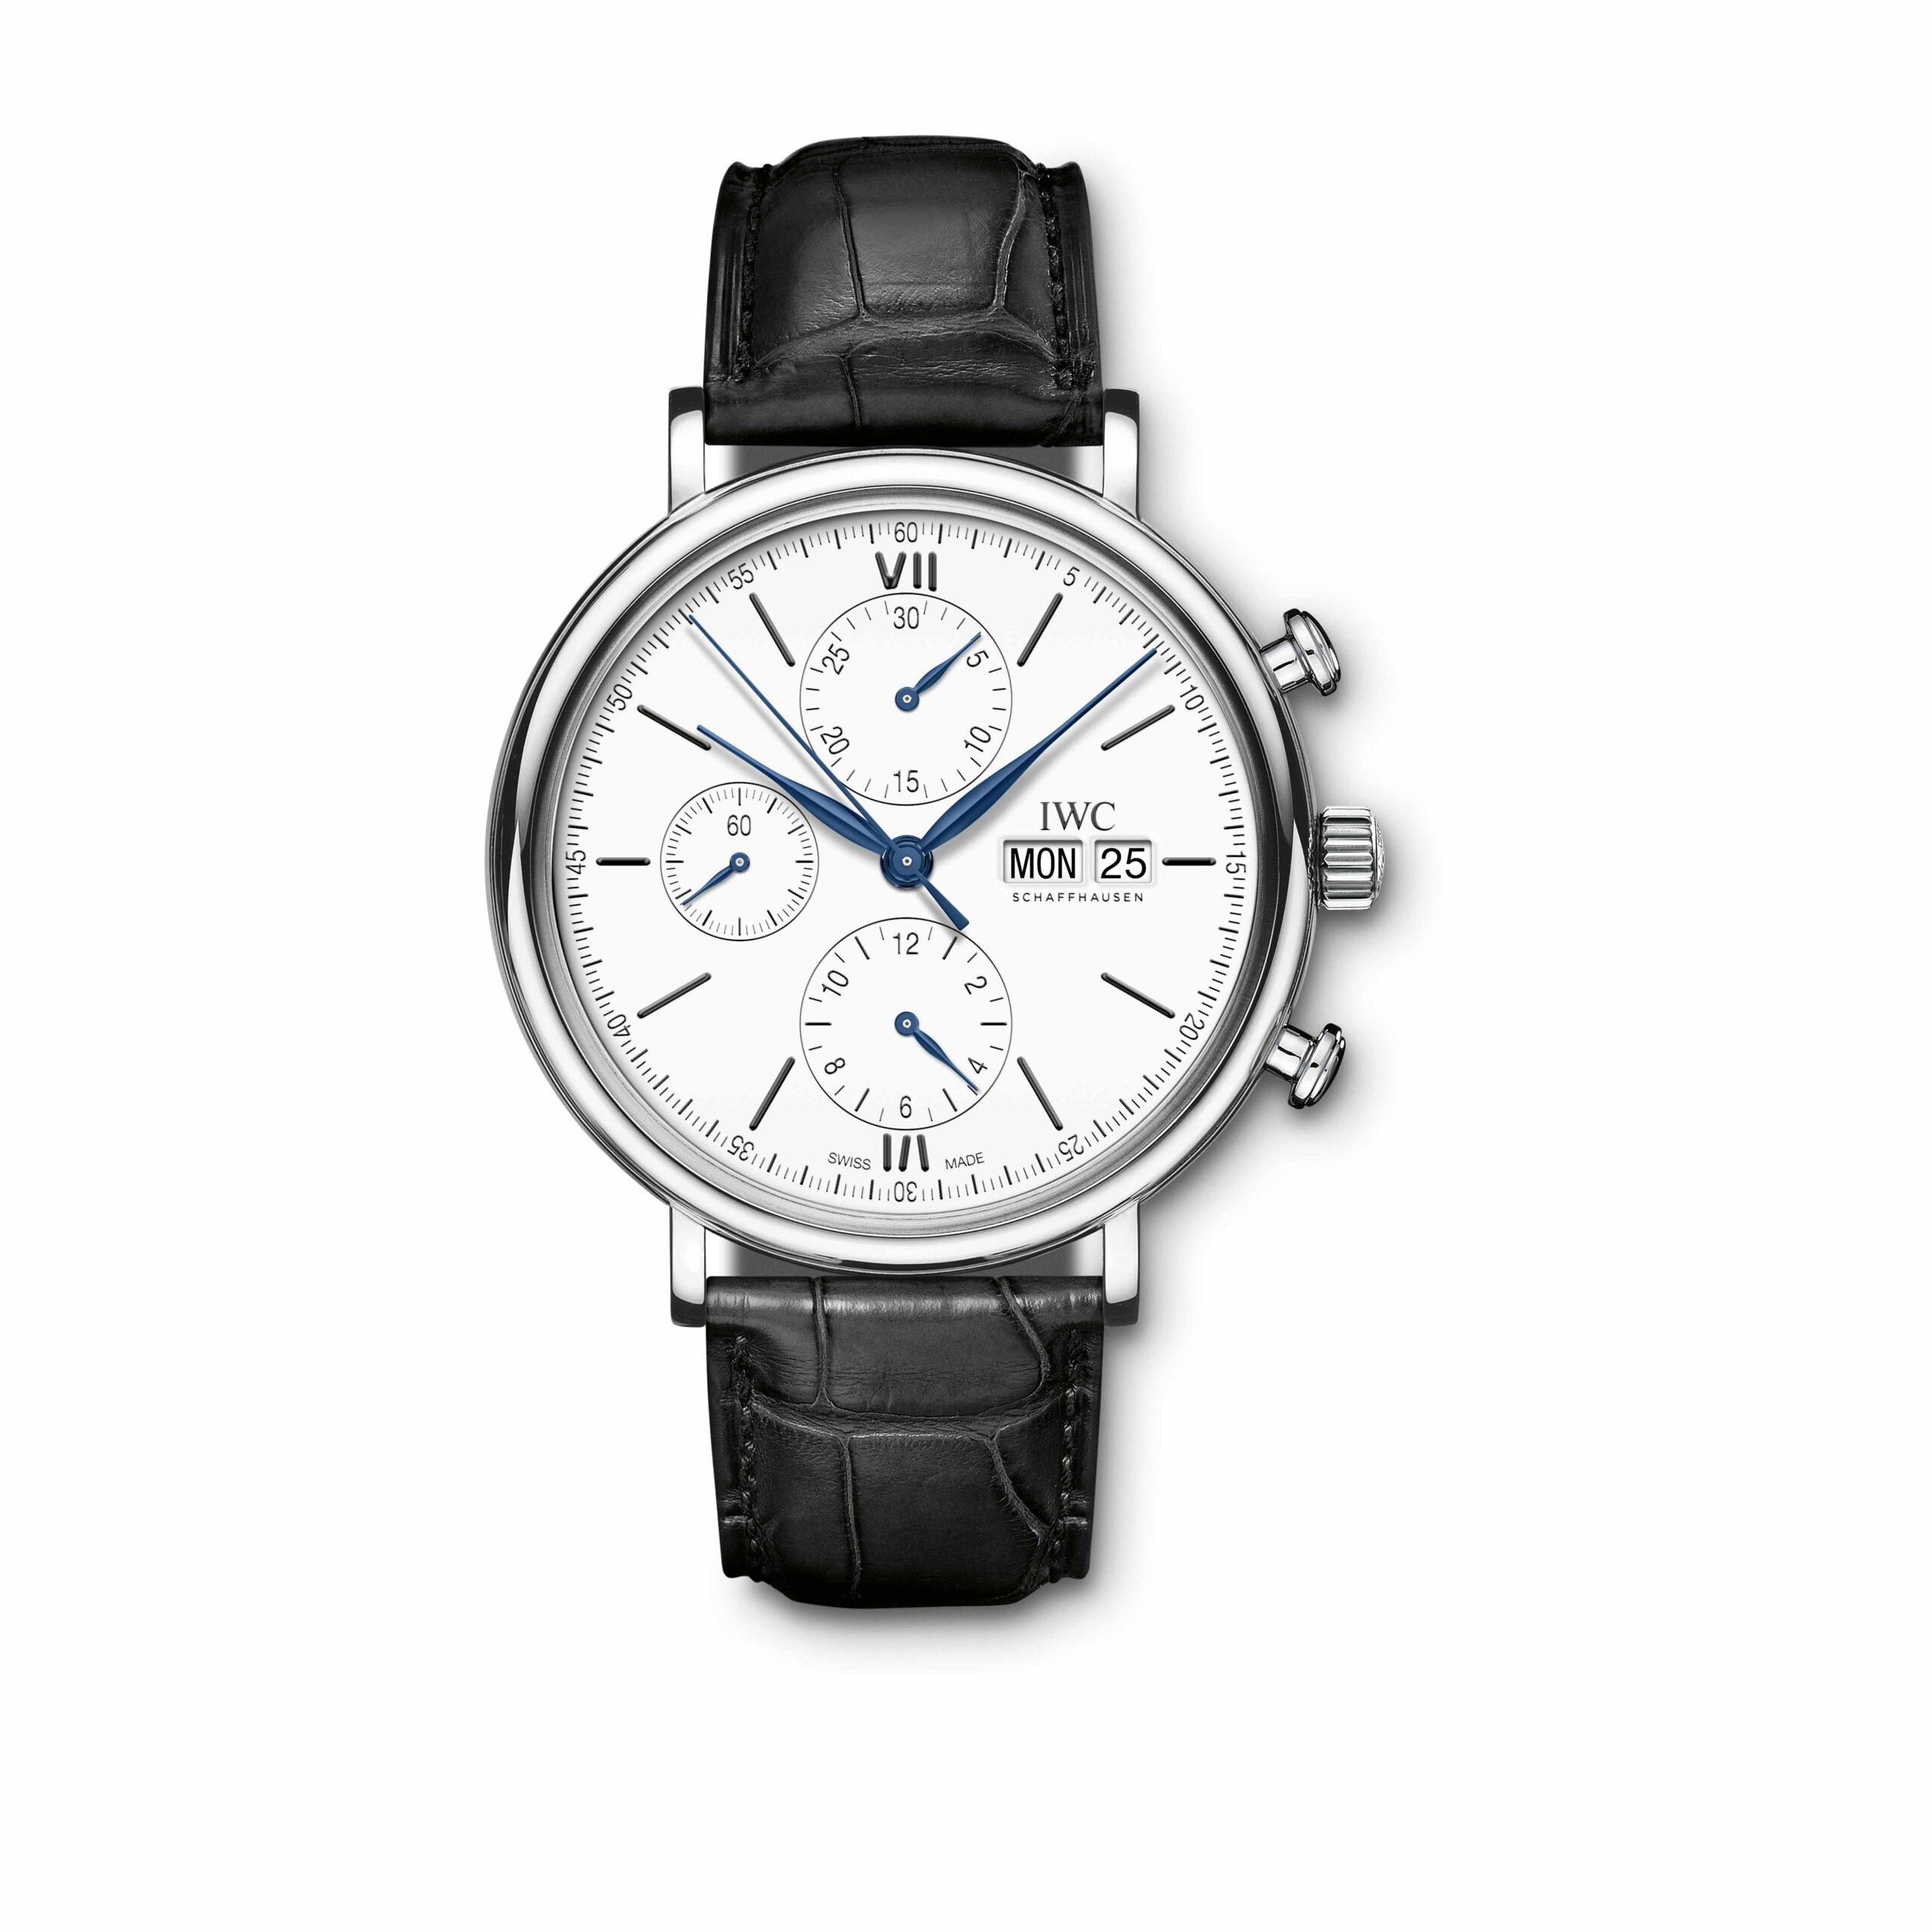 "IWC Portofino Chronograph Edition ""150 Years"" (Ref. 3910)"